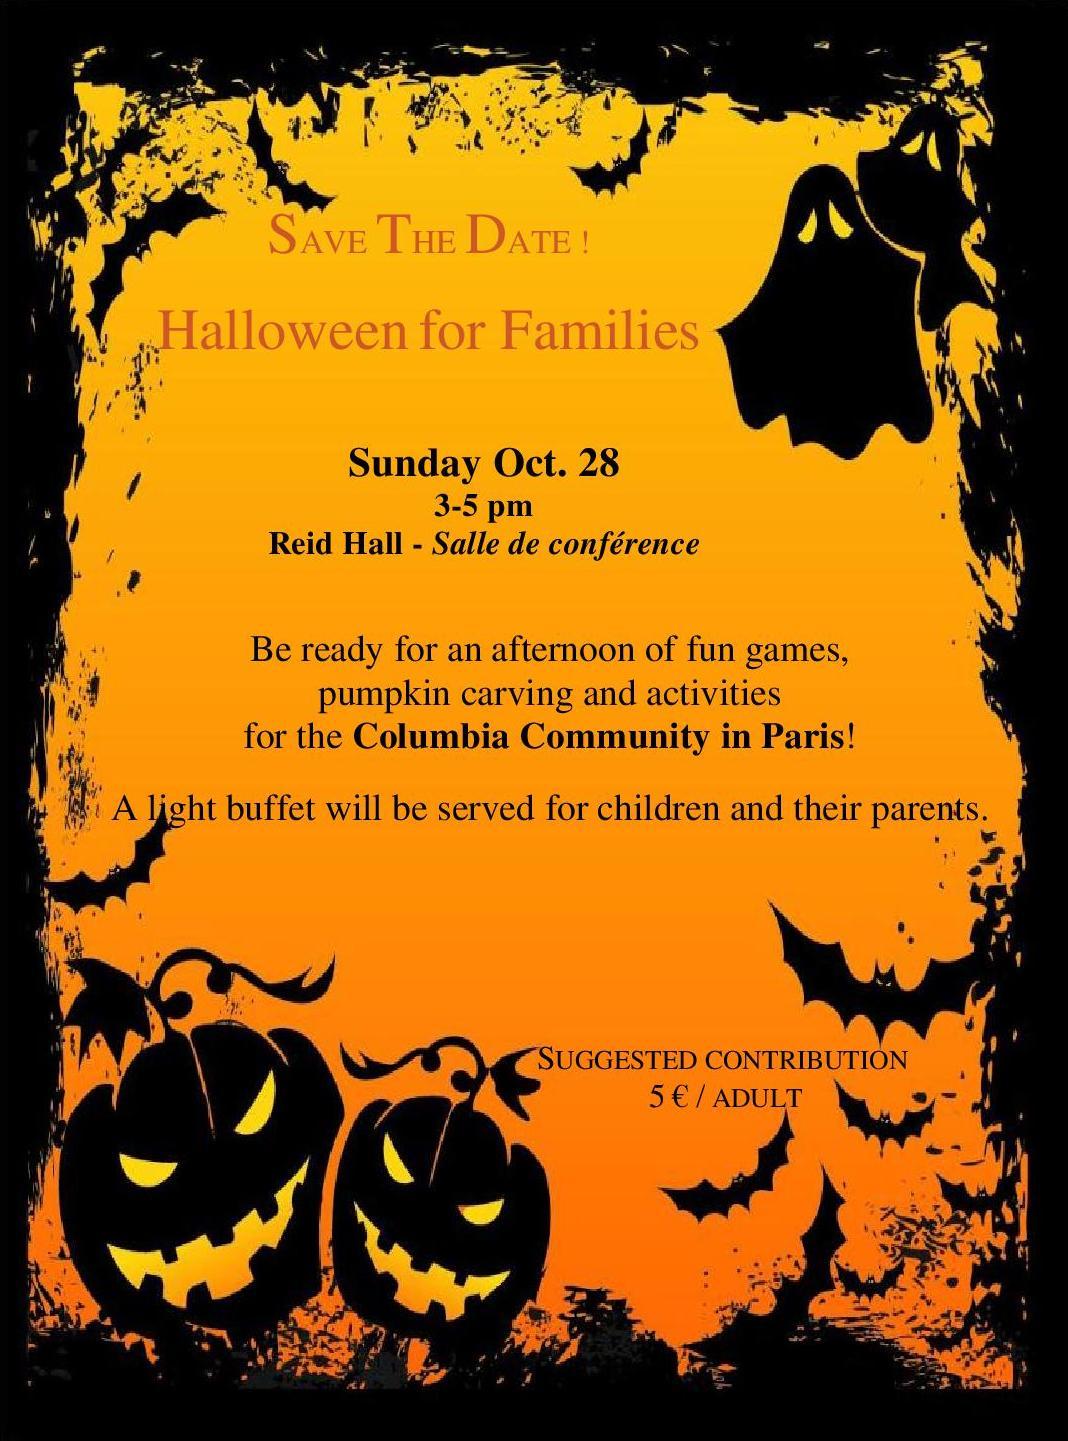 Halloween_Save_the_Date_autre_orange1.jpg